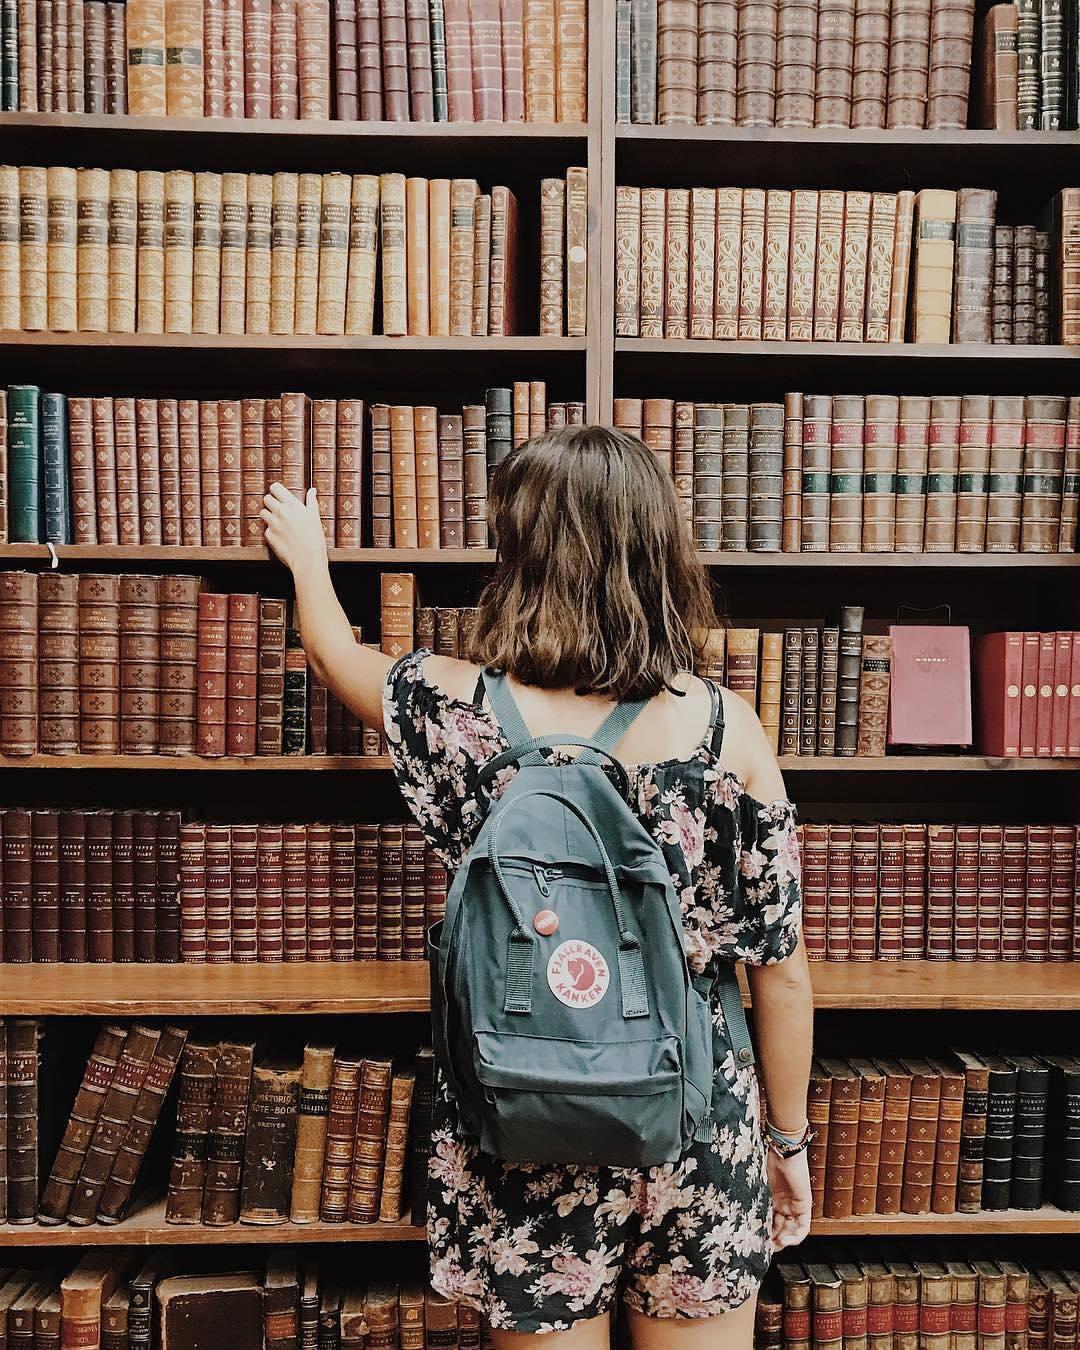 biblioteca-fotografie